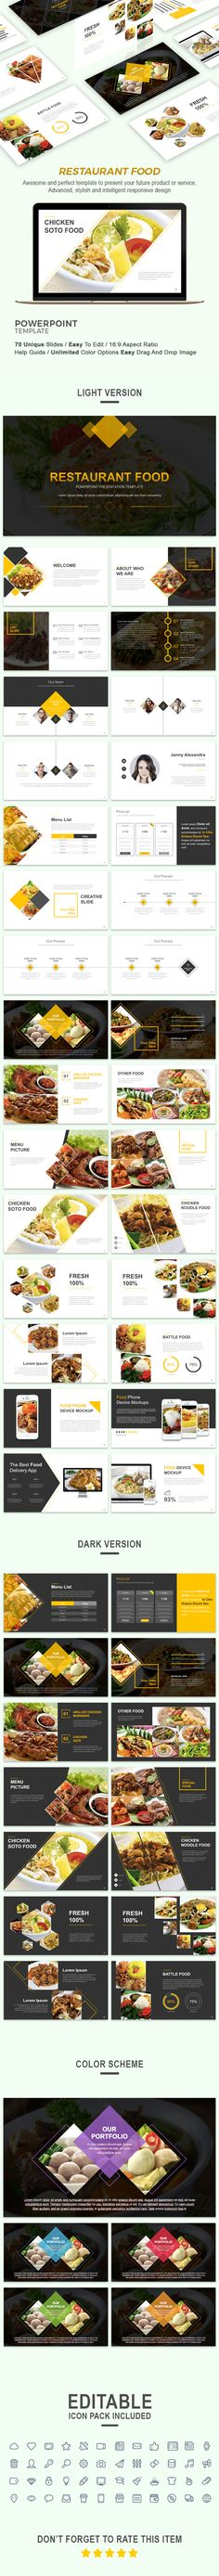 Restaurant Food Presentation Template — Powerpoint PPTX #statistics #social media • Download ➝ https://graphicriver.net/item/restaurant-food-presentation-template/19247757?ref=pxcr